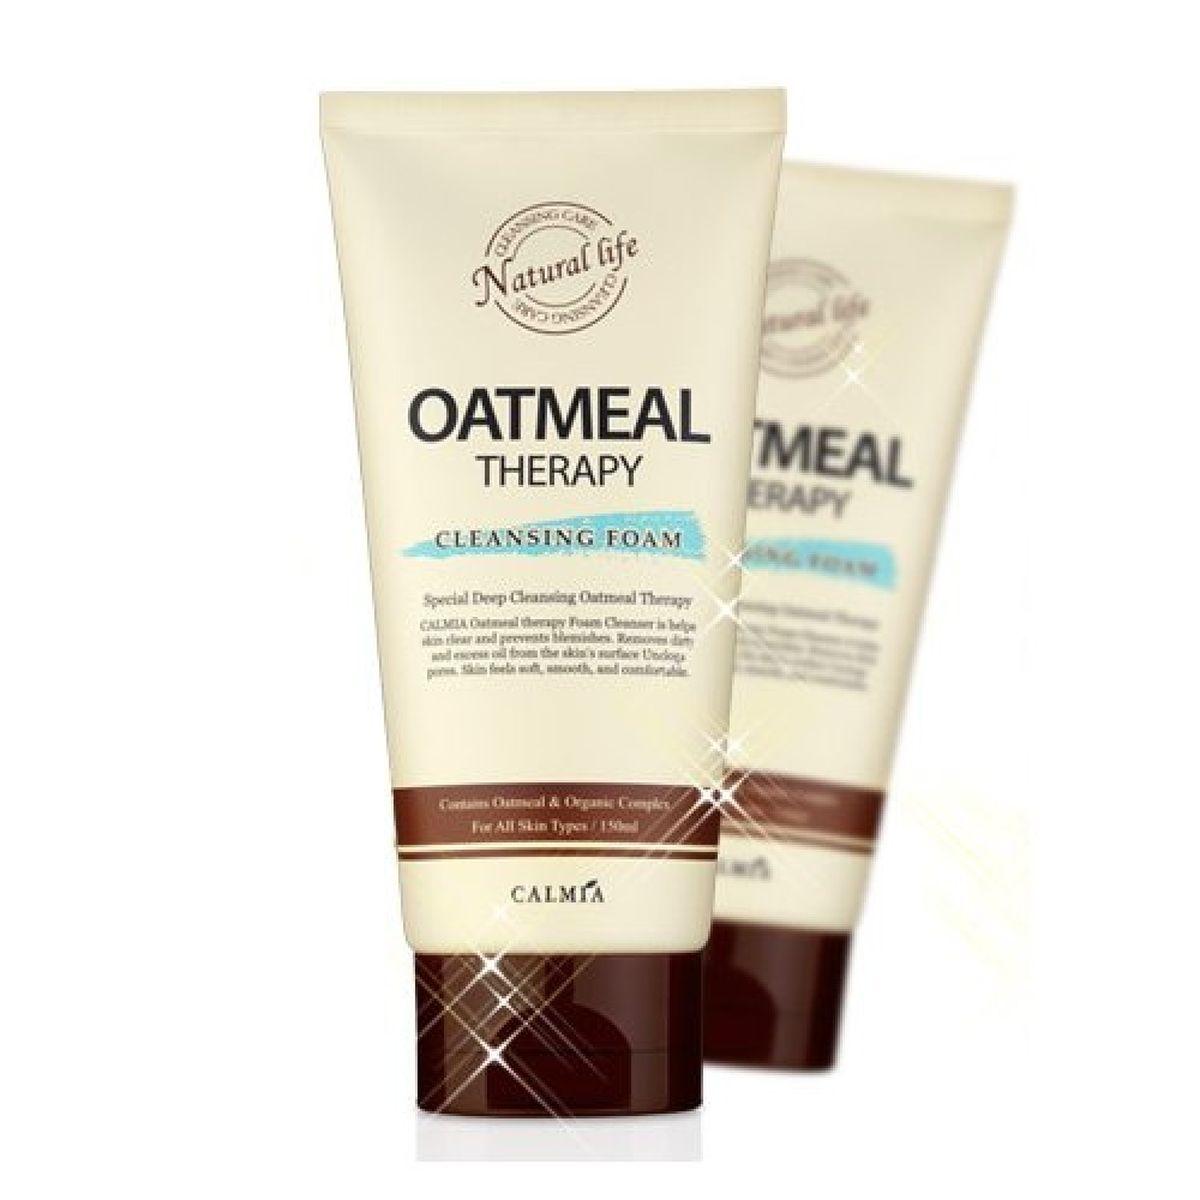 Овсянная пенка для умывания CALMIA Oatmeal Therapy Cleansing Foam - 150 мл